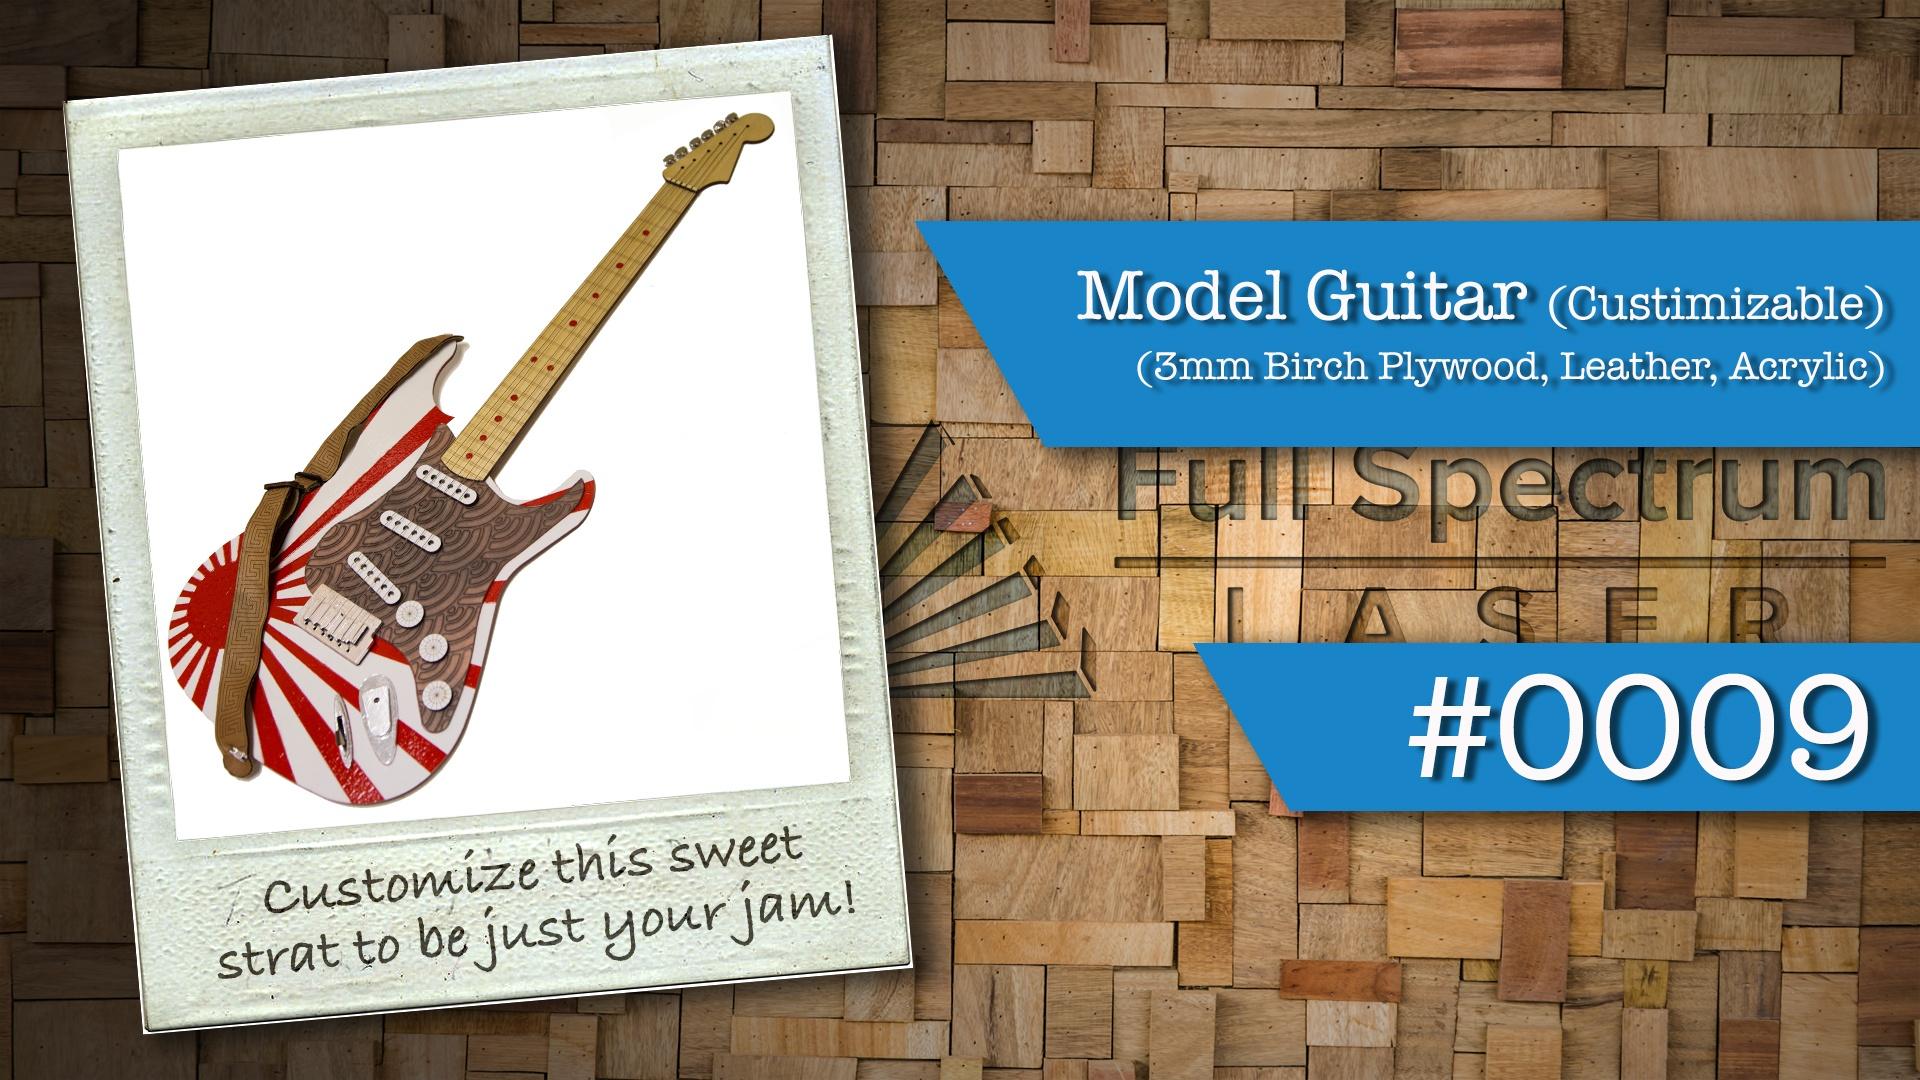 009 - Guitar-1.jpg